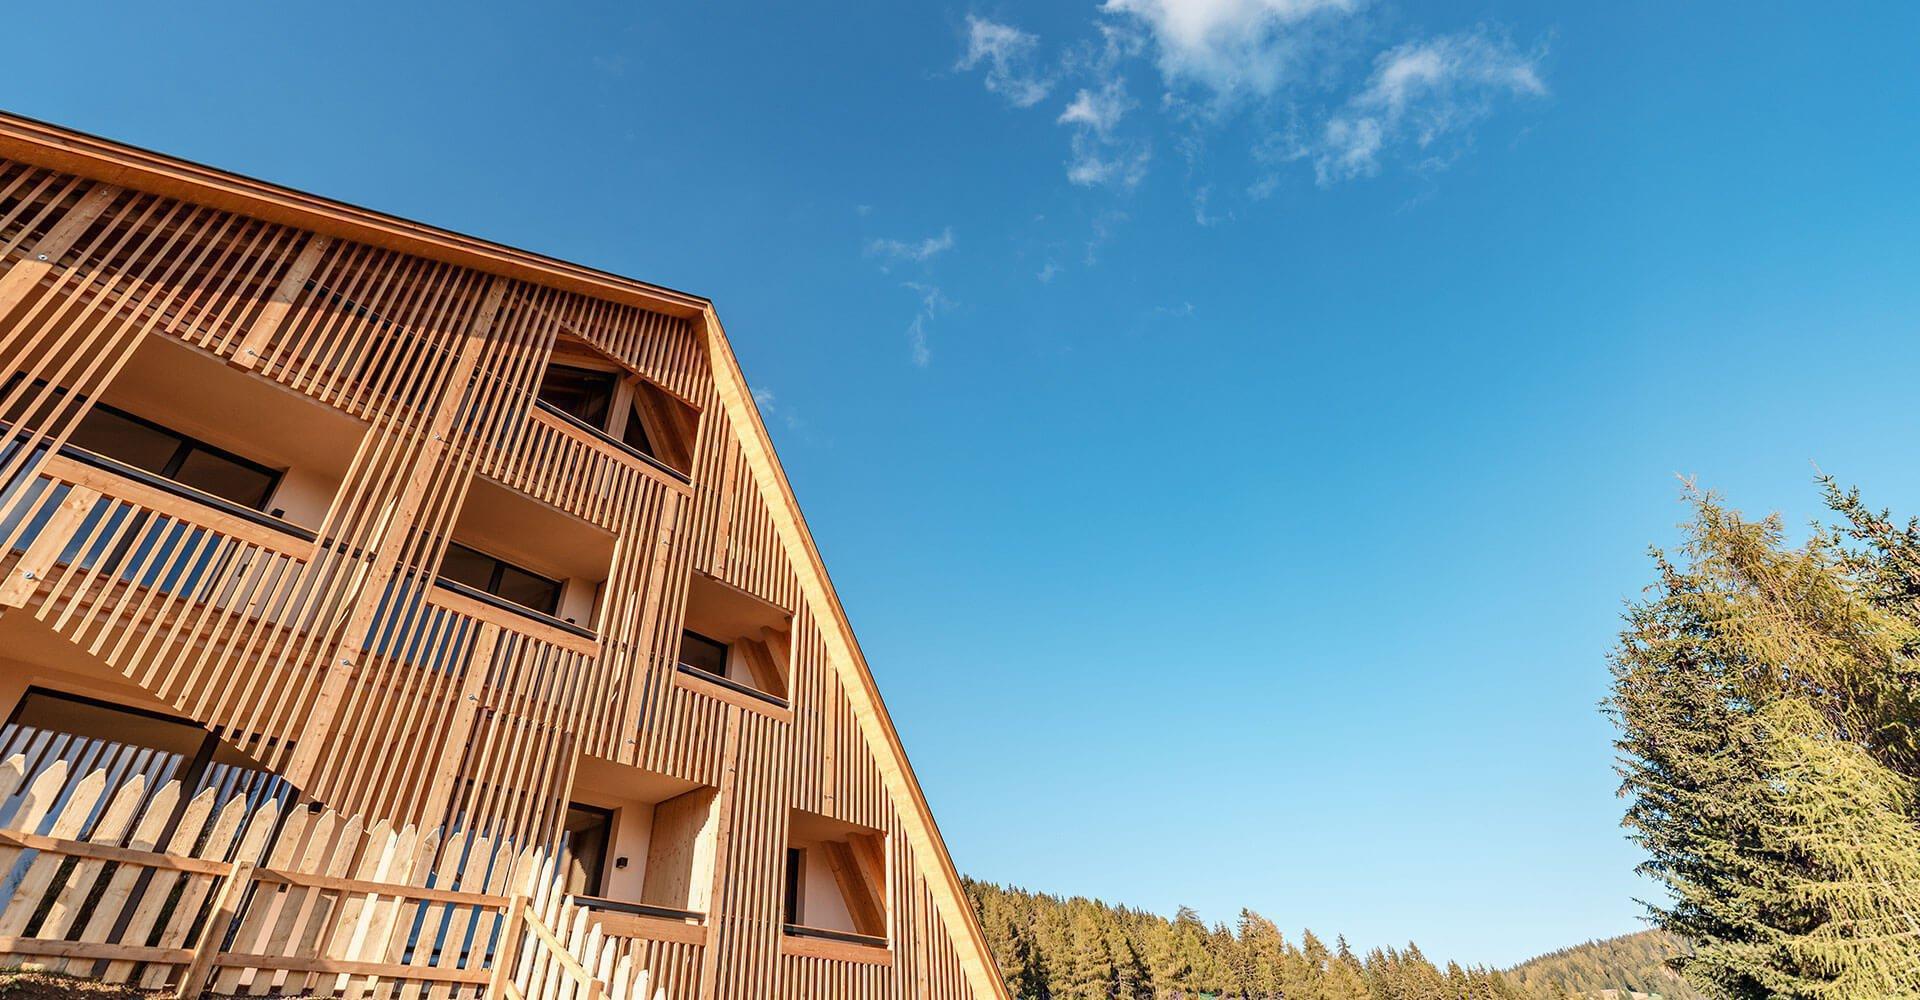 Urlaub in den Dolomiten - Oberhauserhütte Südtirol